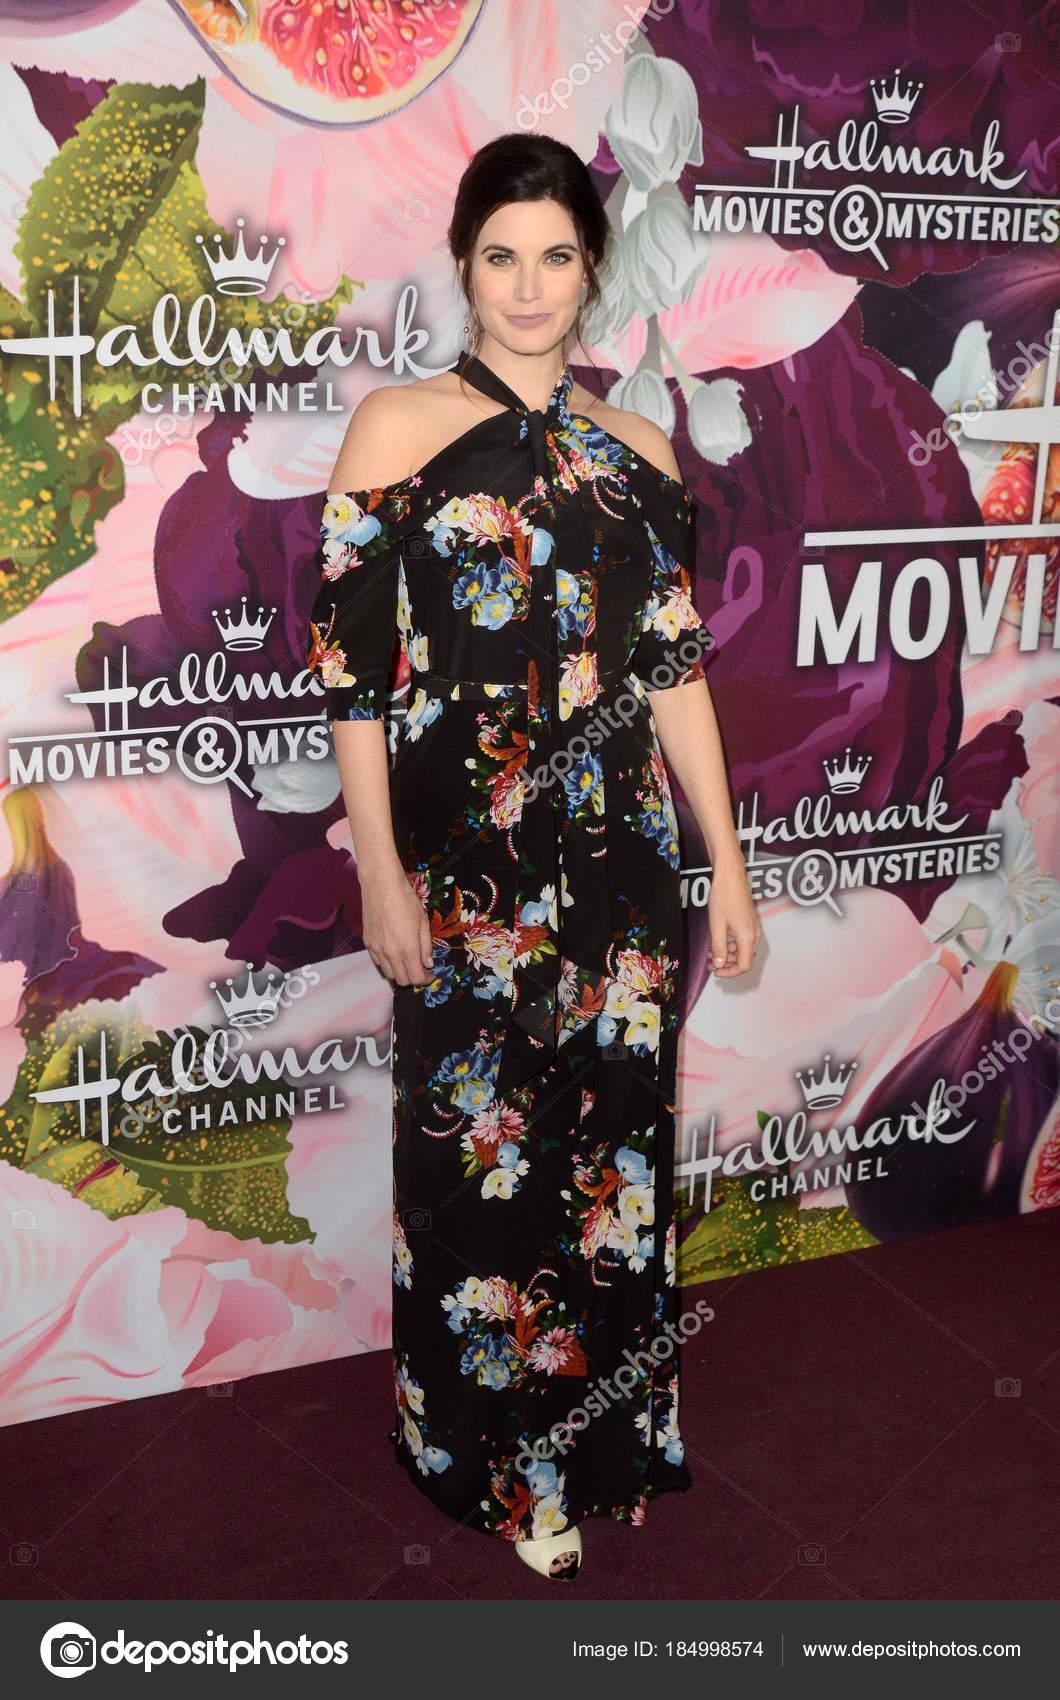 Hallmark Movies And Mysteries.Meghan Ory Hallmark Channel Hallmark Movies Mysteries Winter 2018